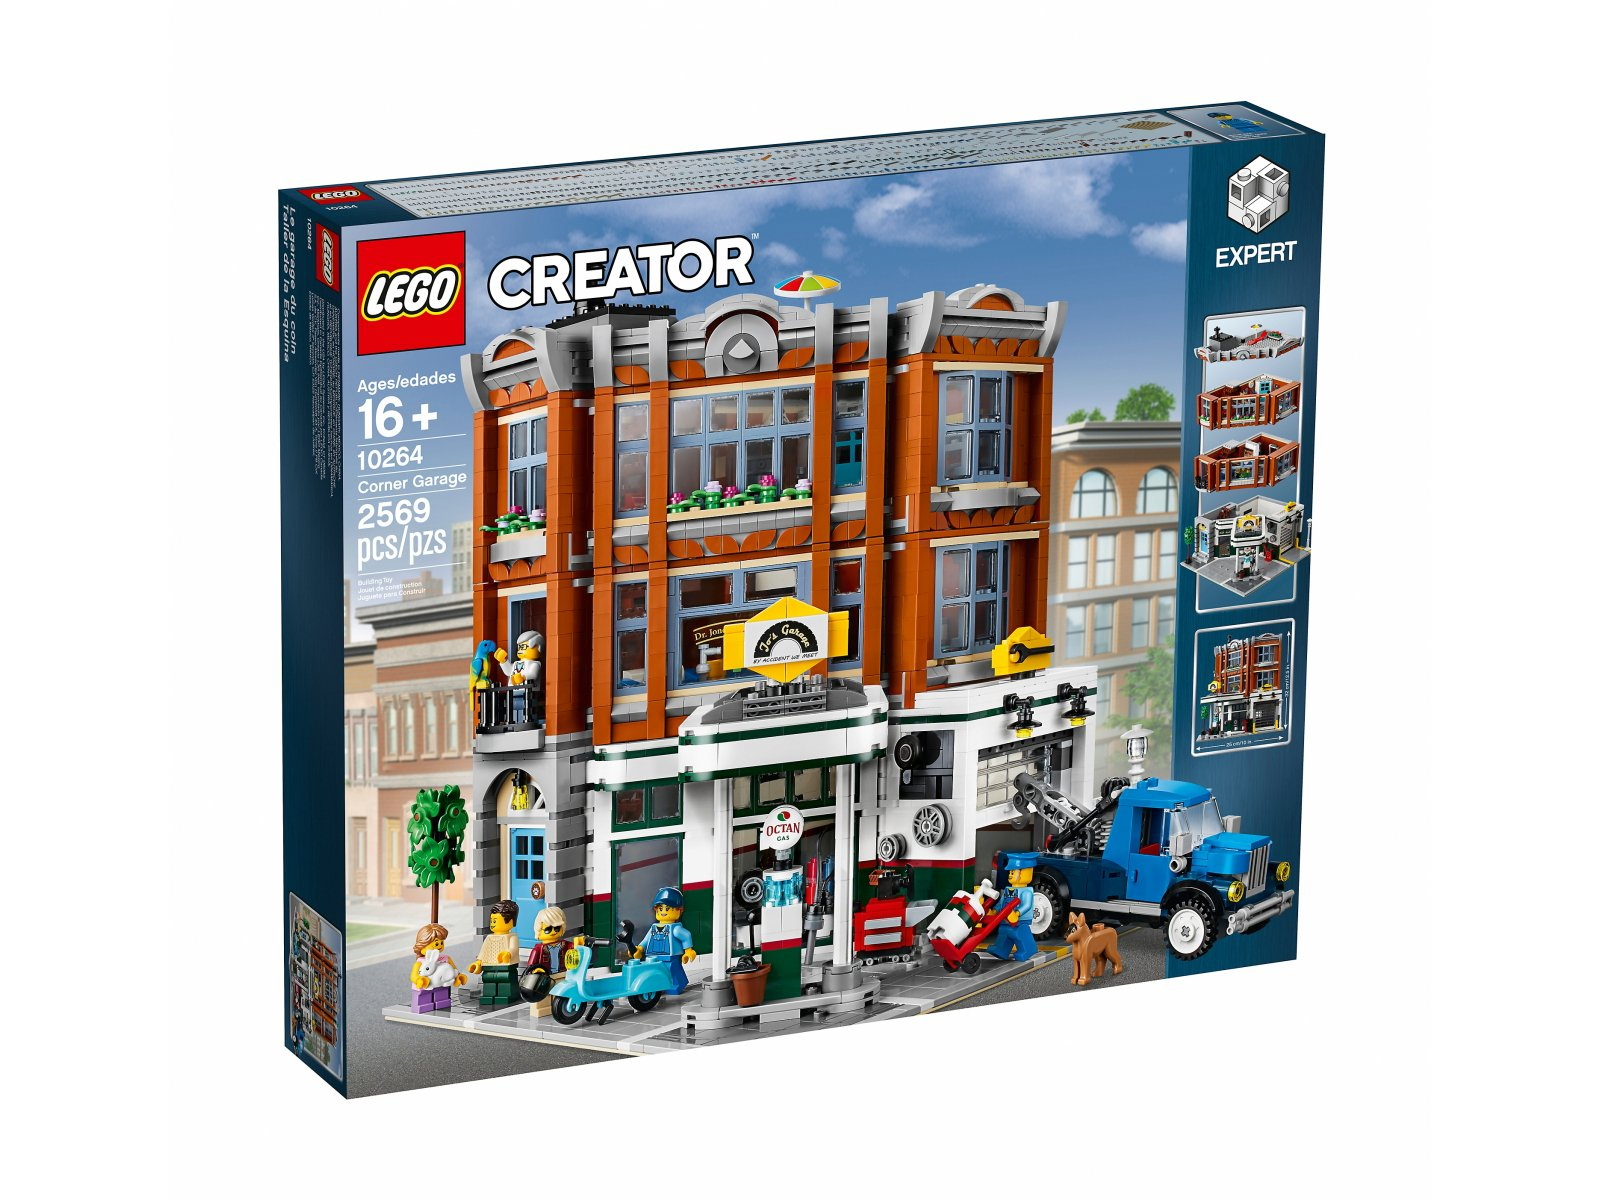 LEGO Creator Expert Warsztat na rogu